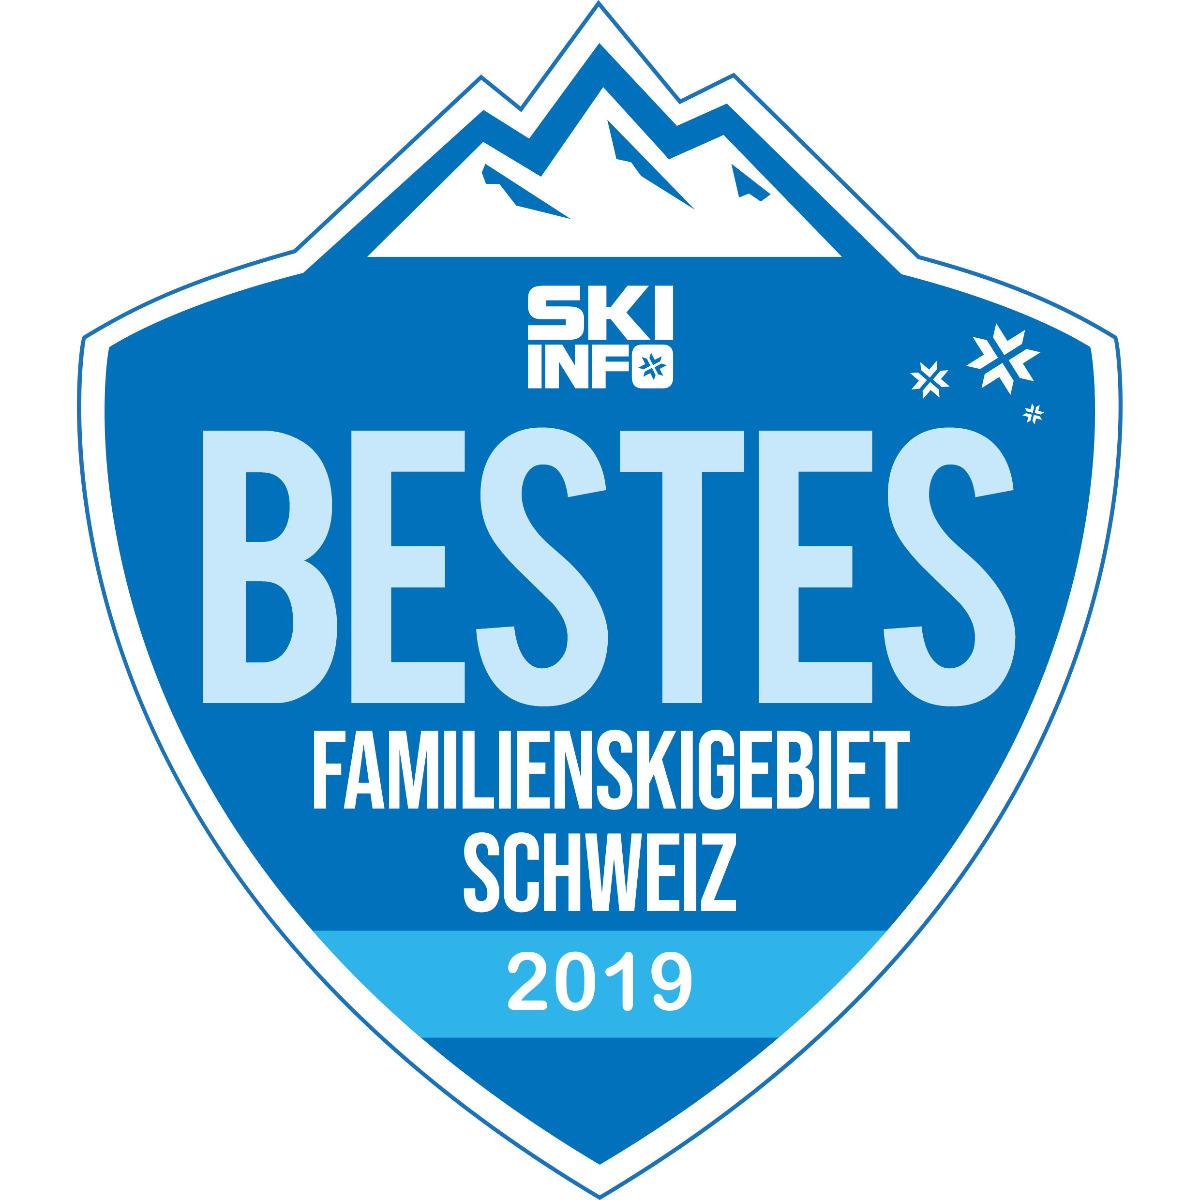 Bestes Familienskigebiet Schweiz 2018/2019